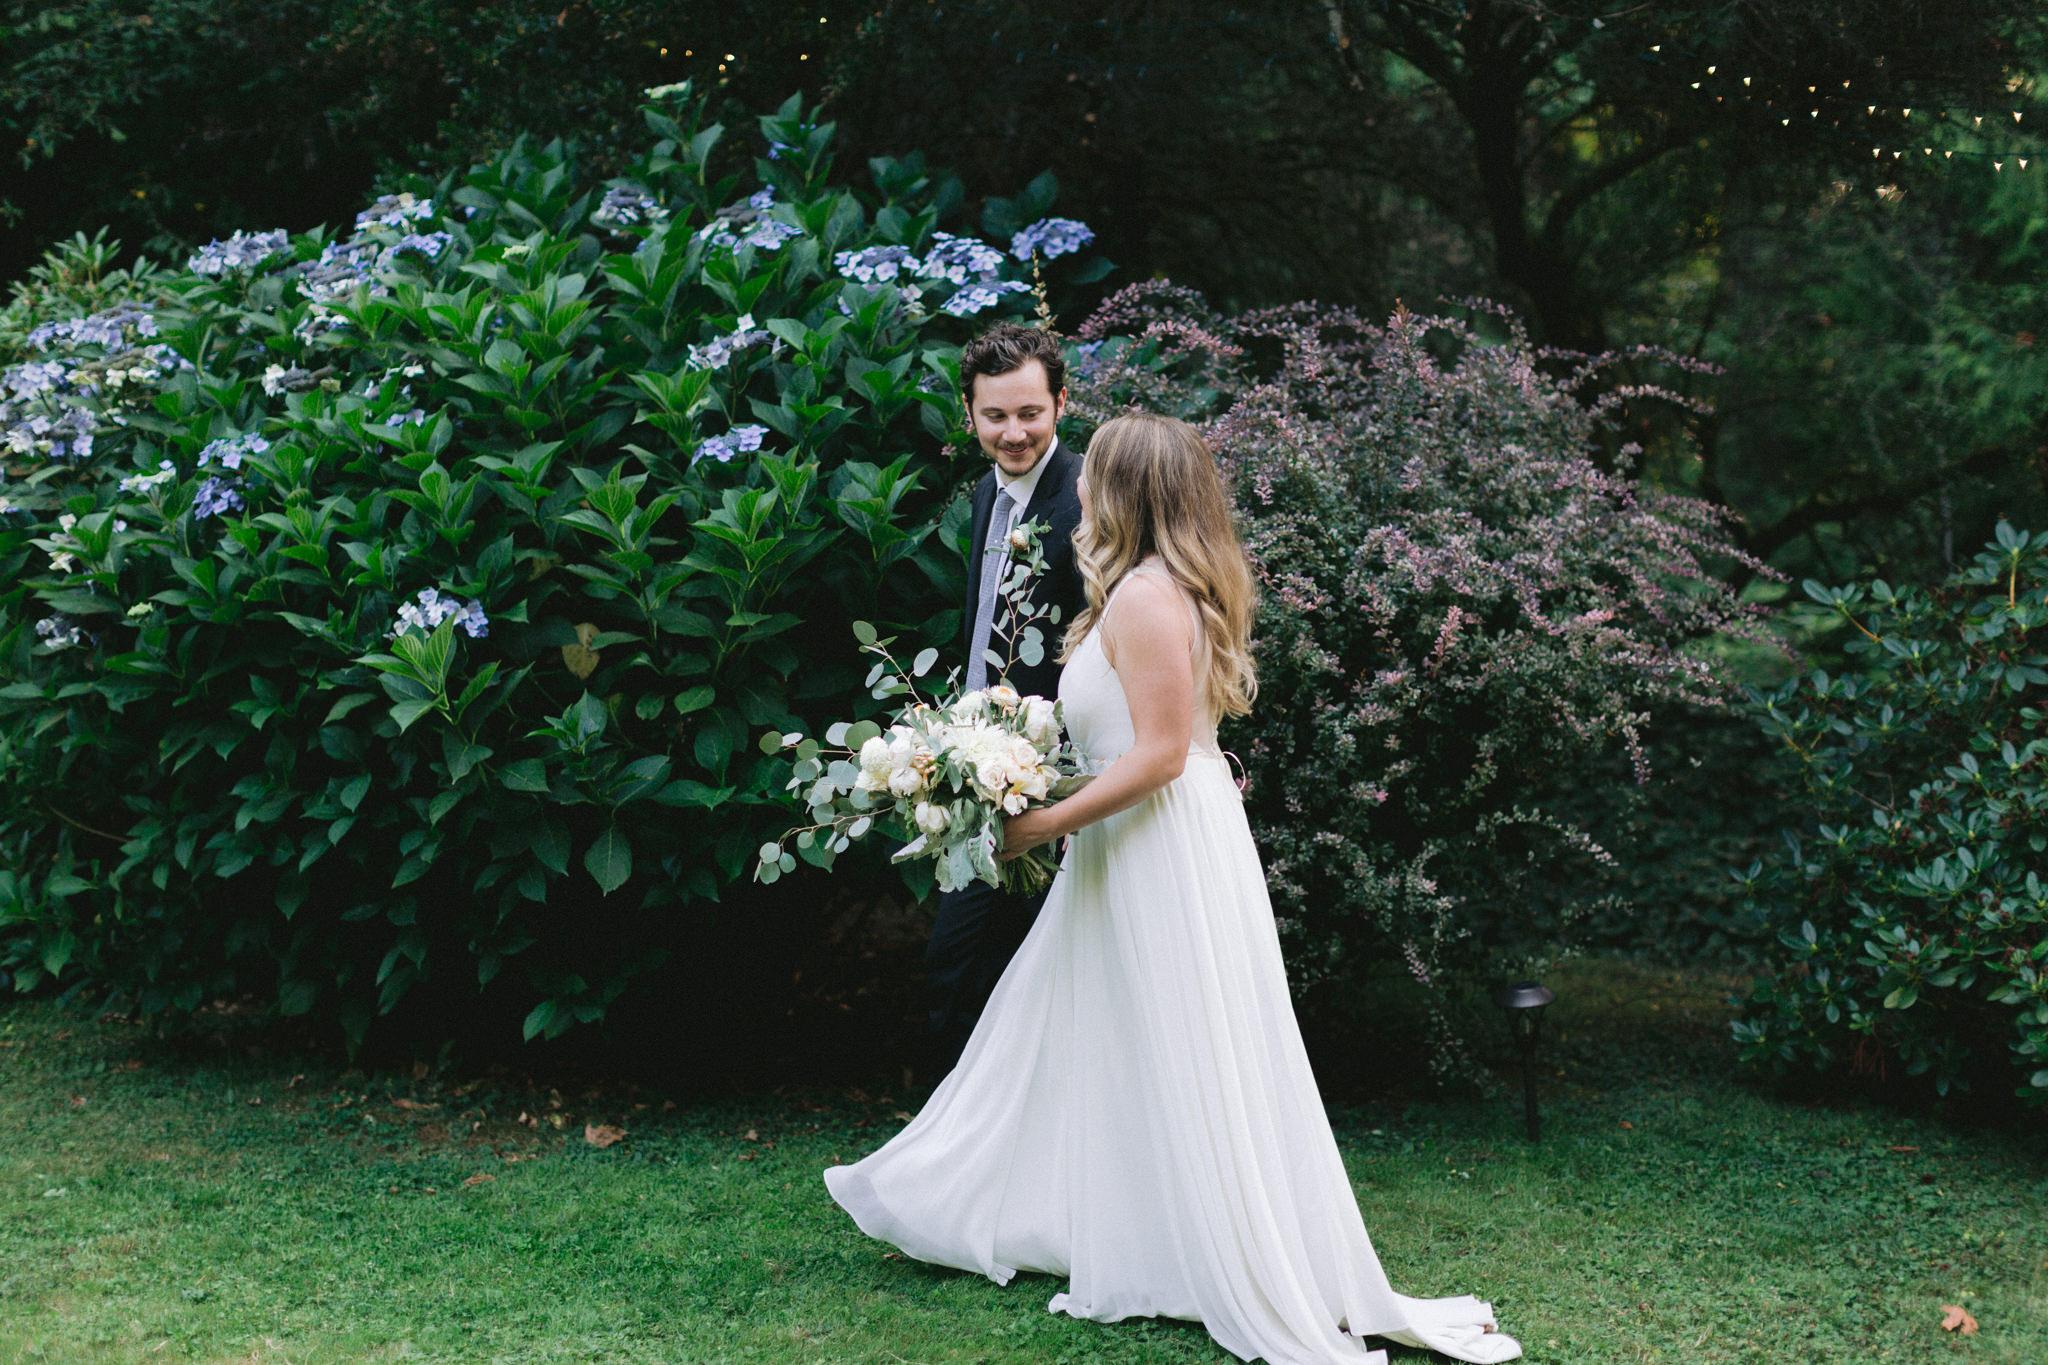 Backyard-Bainbridge-Island-Wedding-Alycia-Lovell-Photography-170.JPG